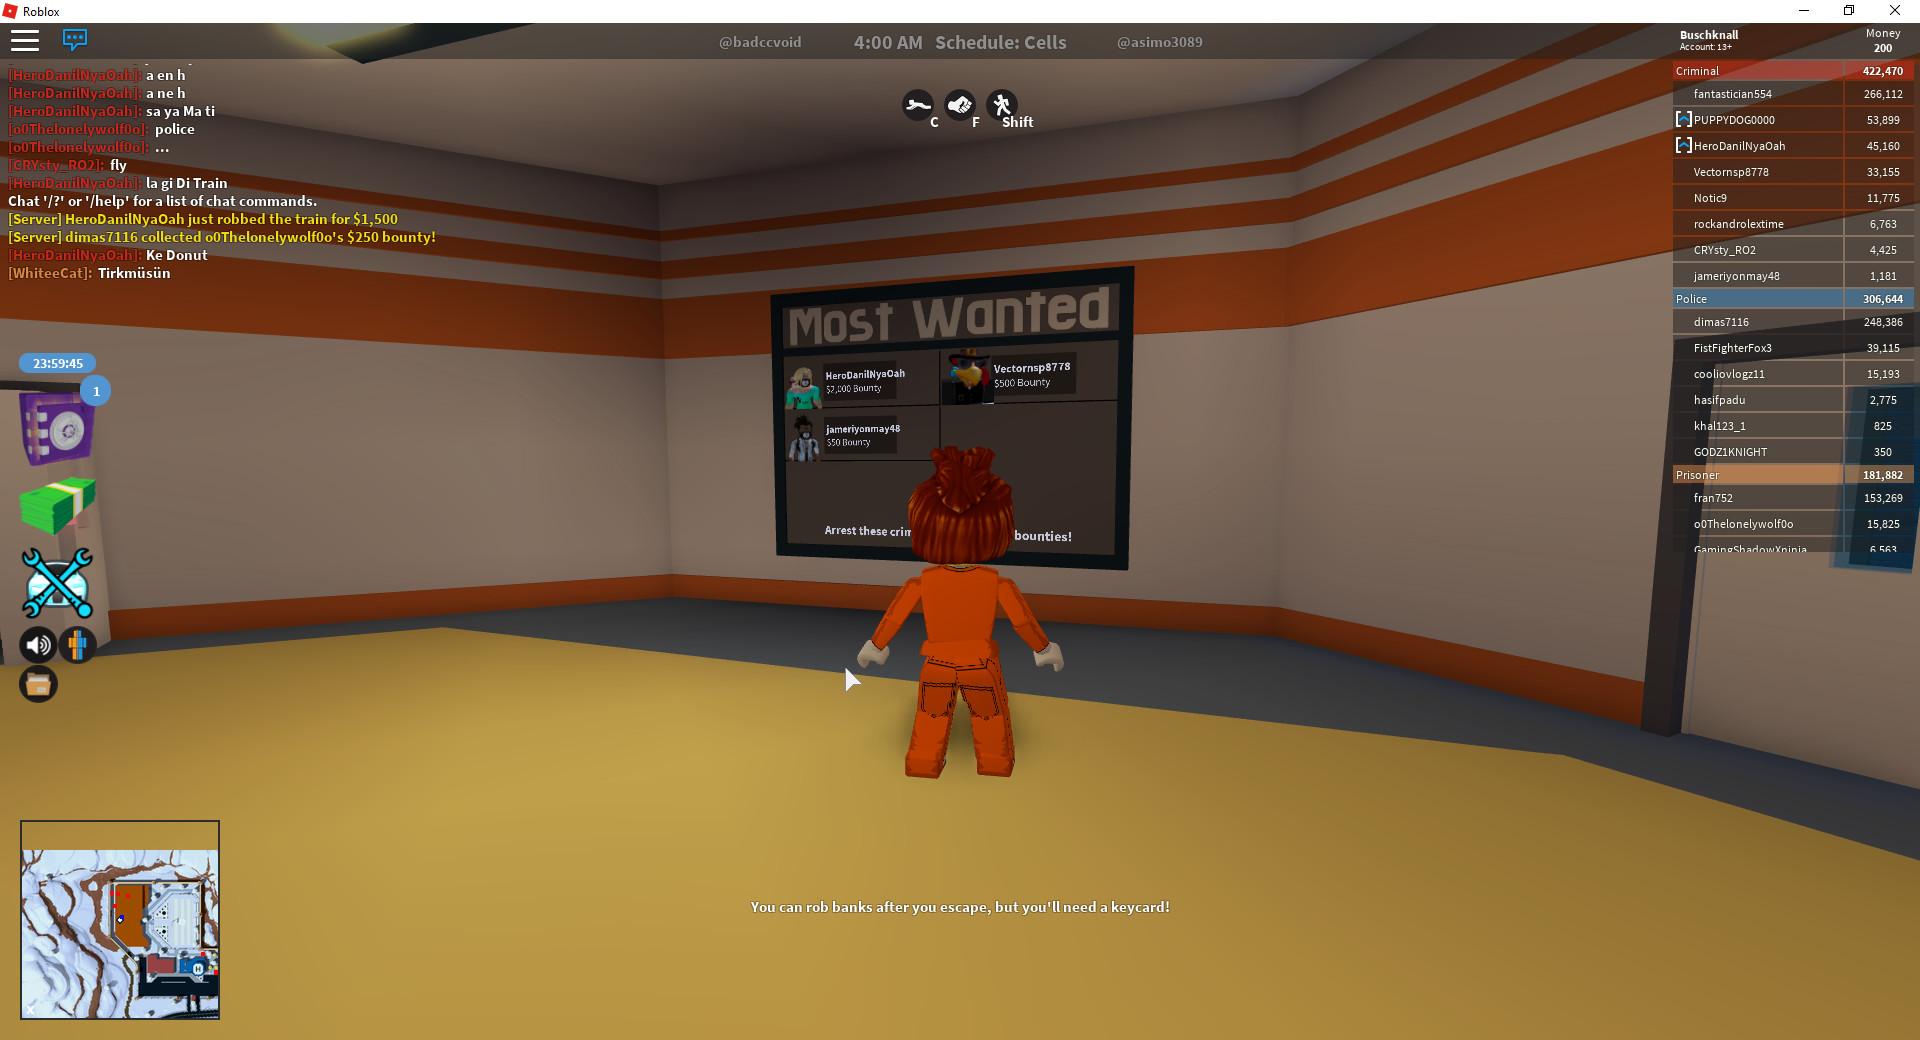 Screenshot 1 - Roblox